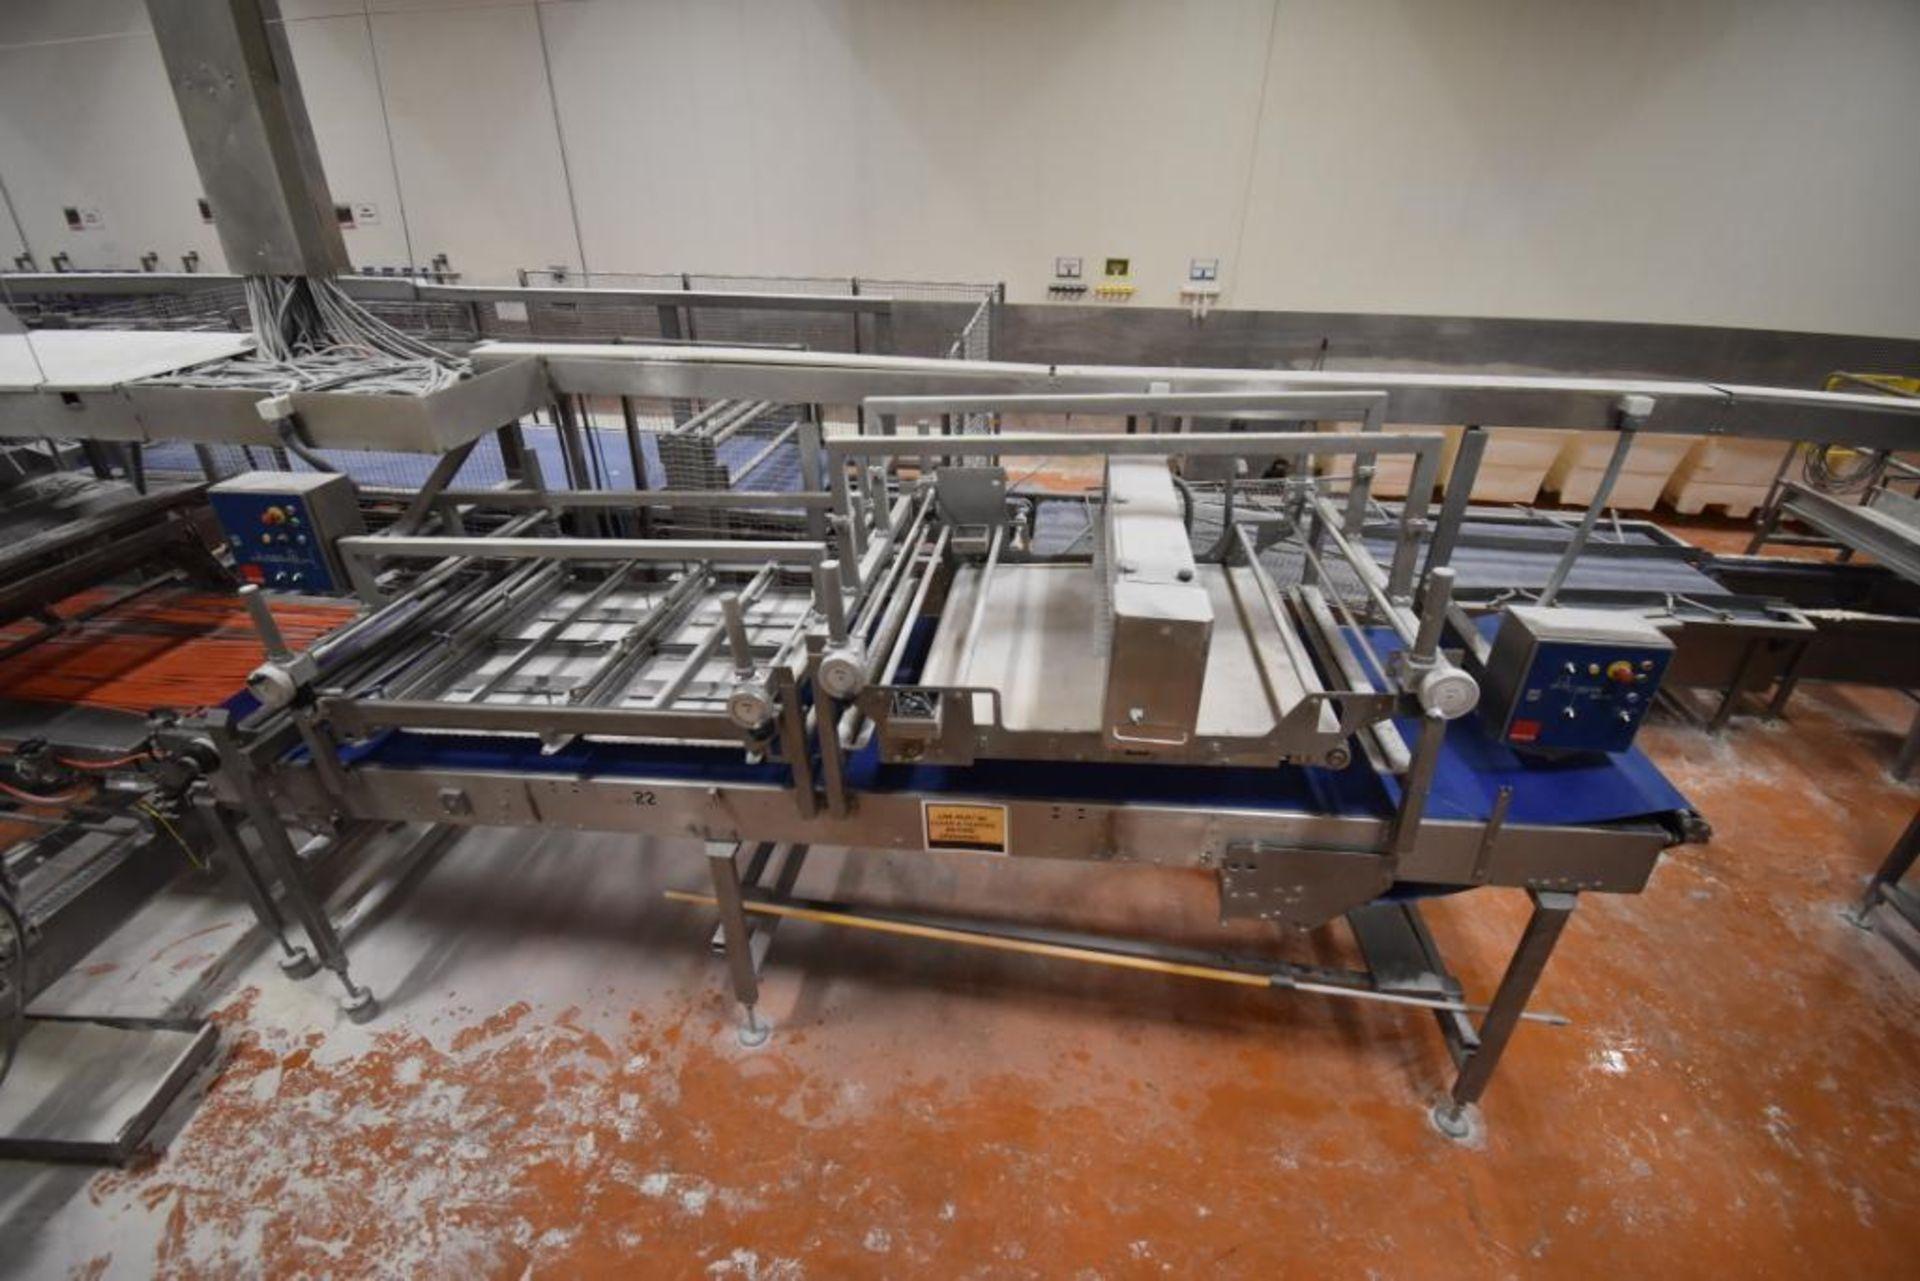 2007 Fritsch Laminator 3000 dough line - Image 238 of 280